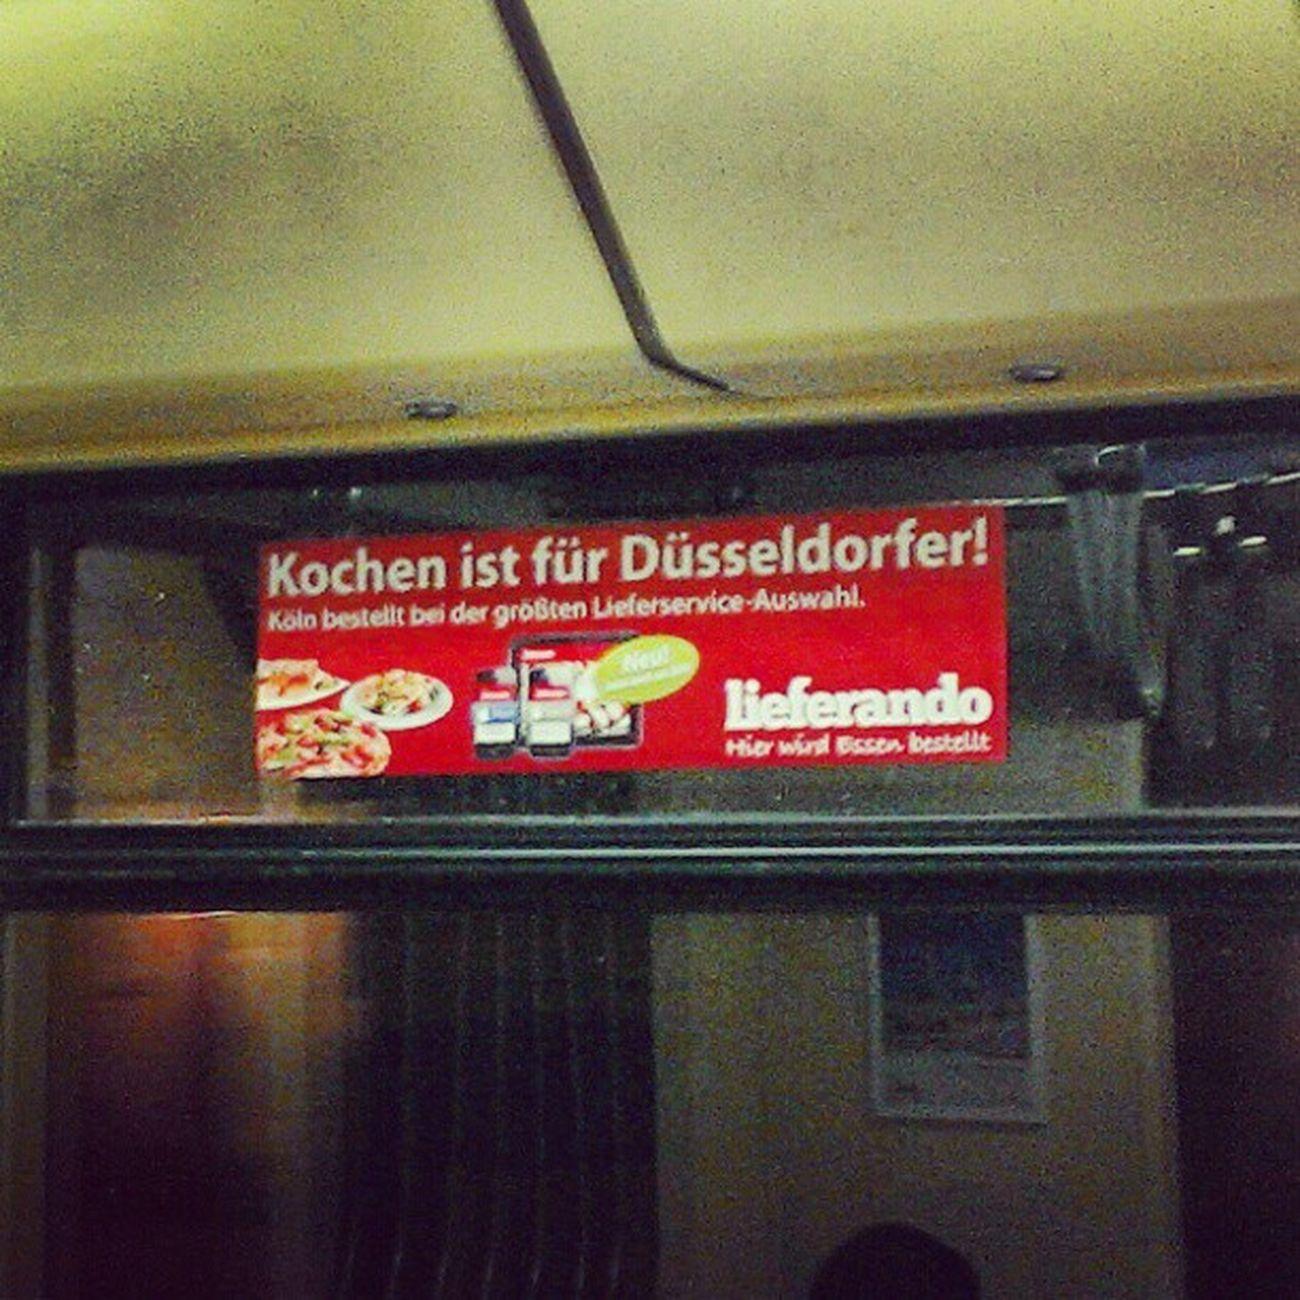 Tram Werbung in Köln. Finde ich lustig! ;-) #Köln #Düsseldorf Köln Düsseldorf